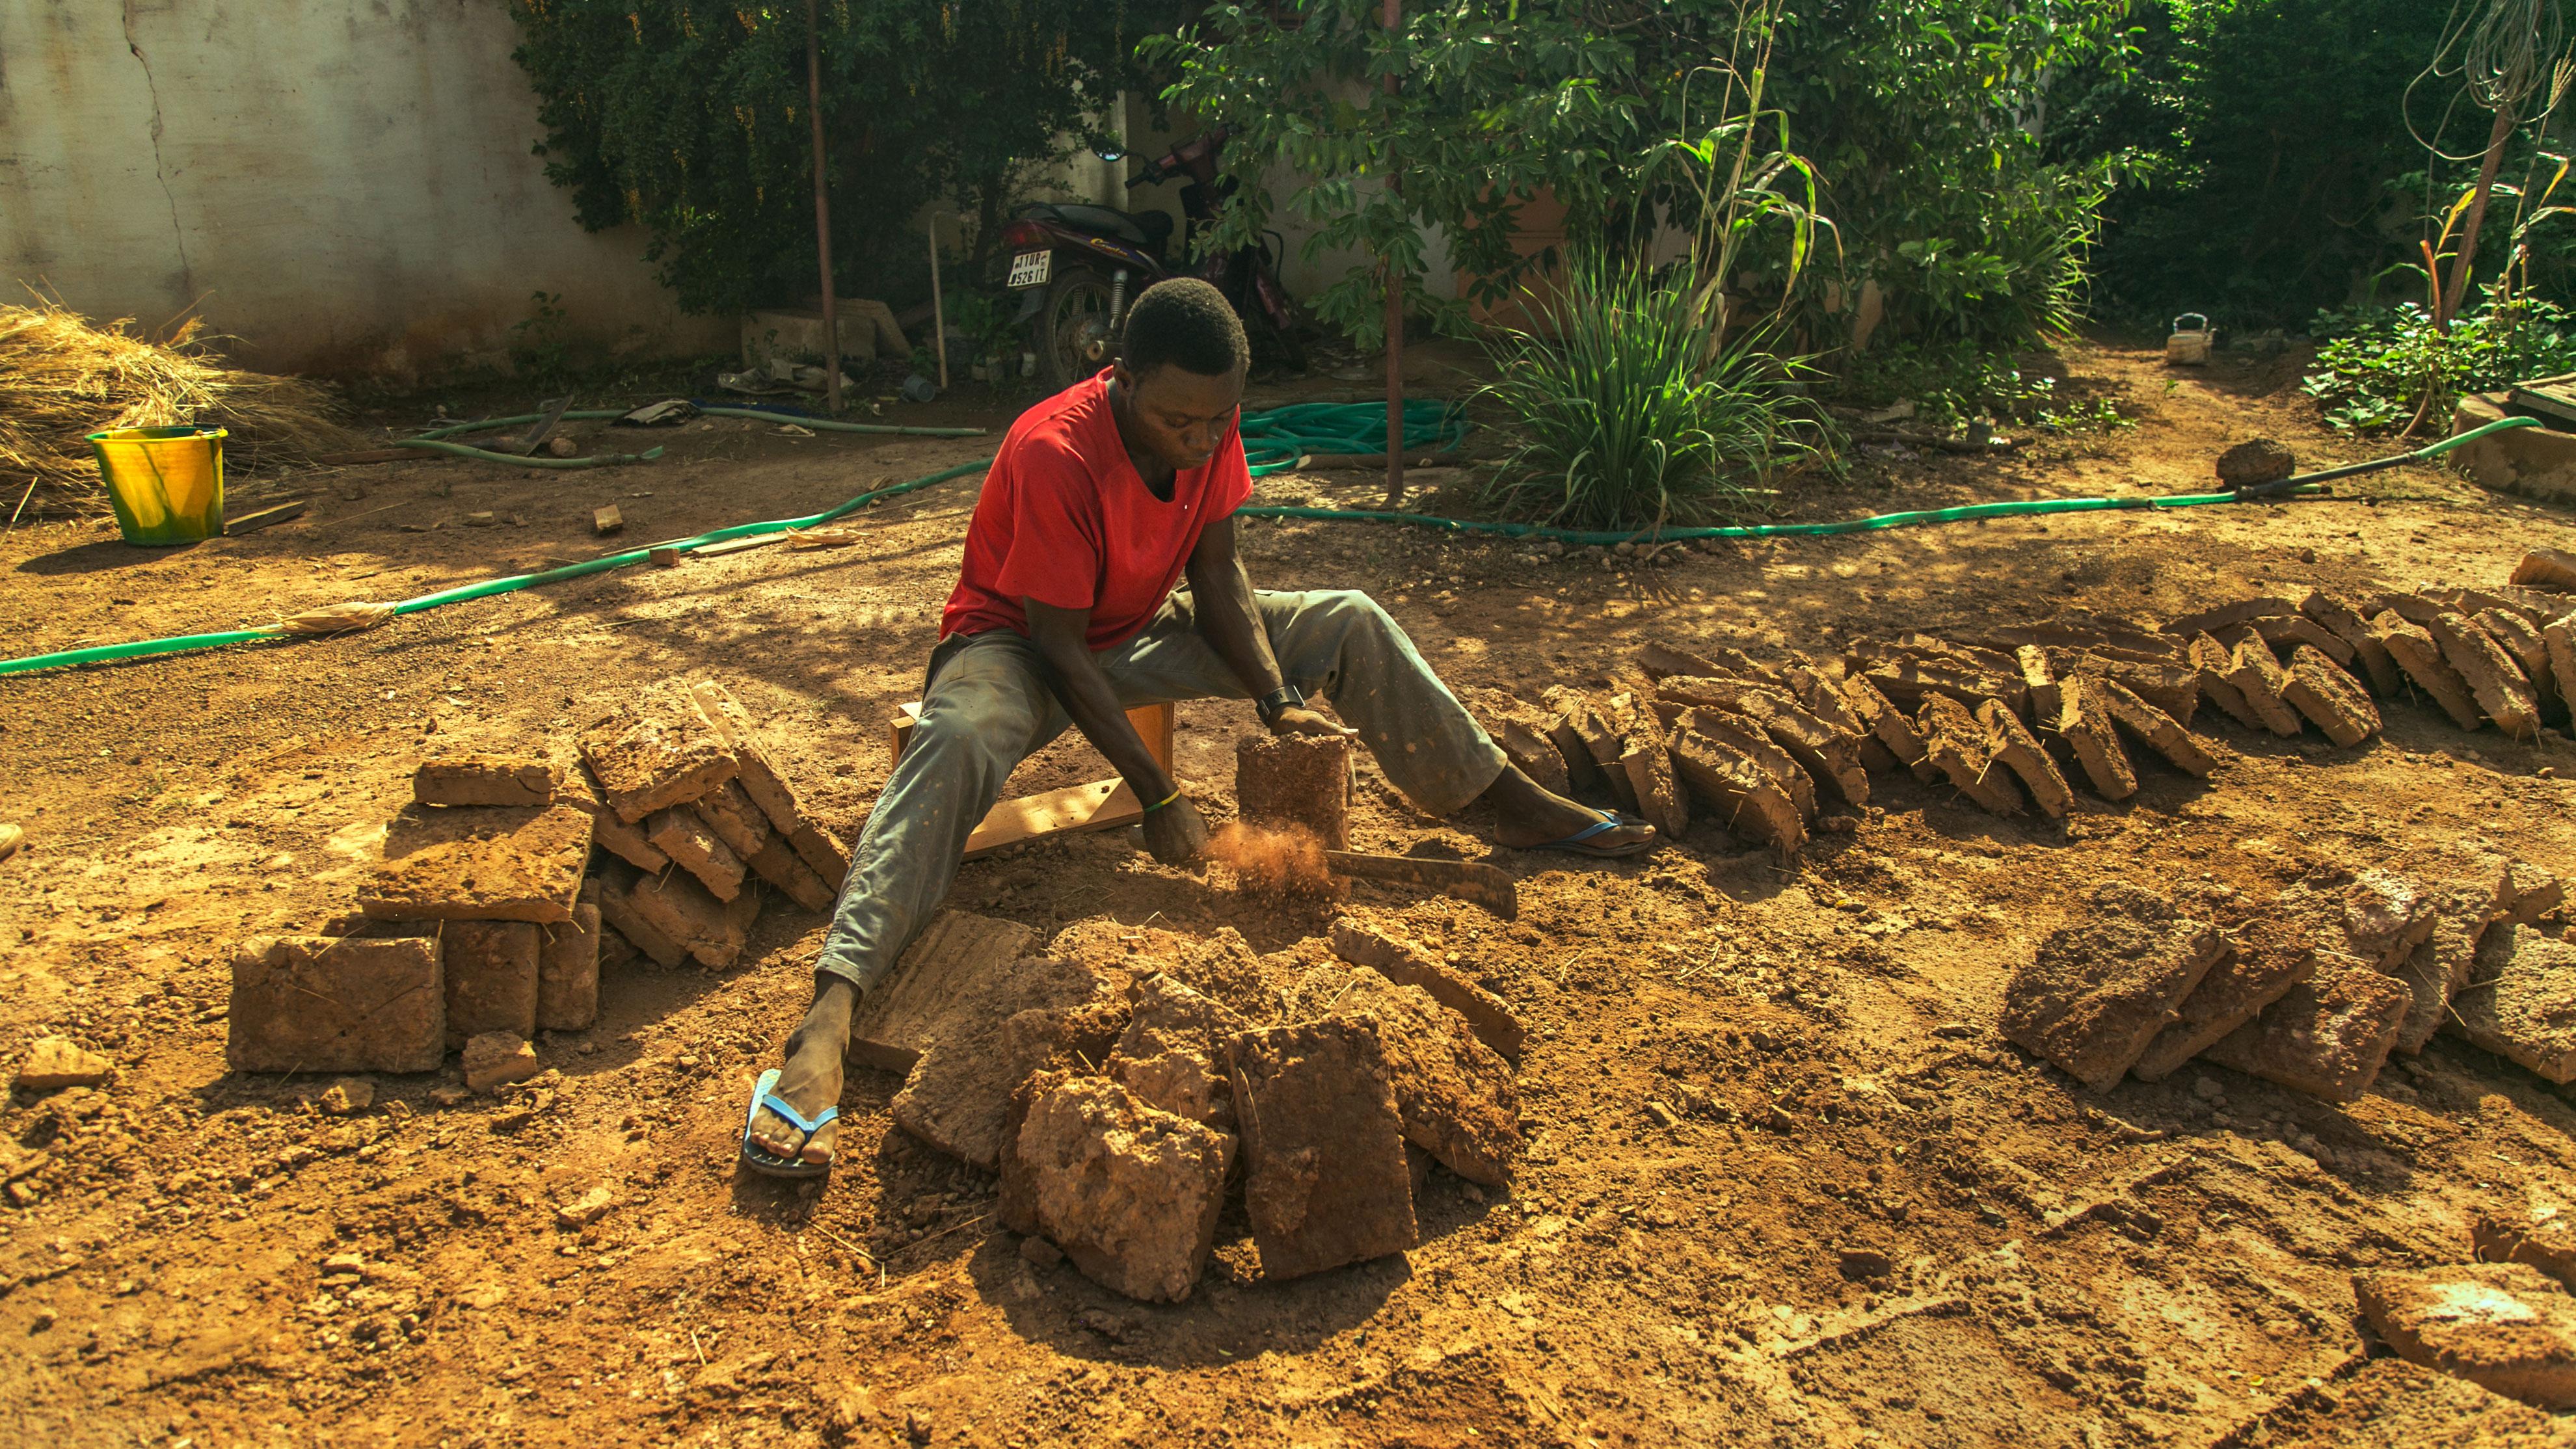 Making_bricks_-_Earth_Roofs_in_the_Sahel_Program.jpg